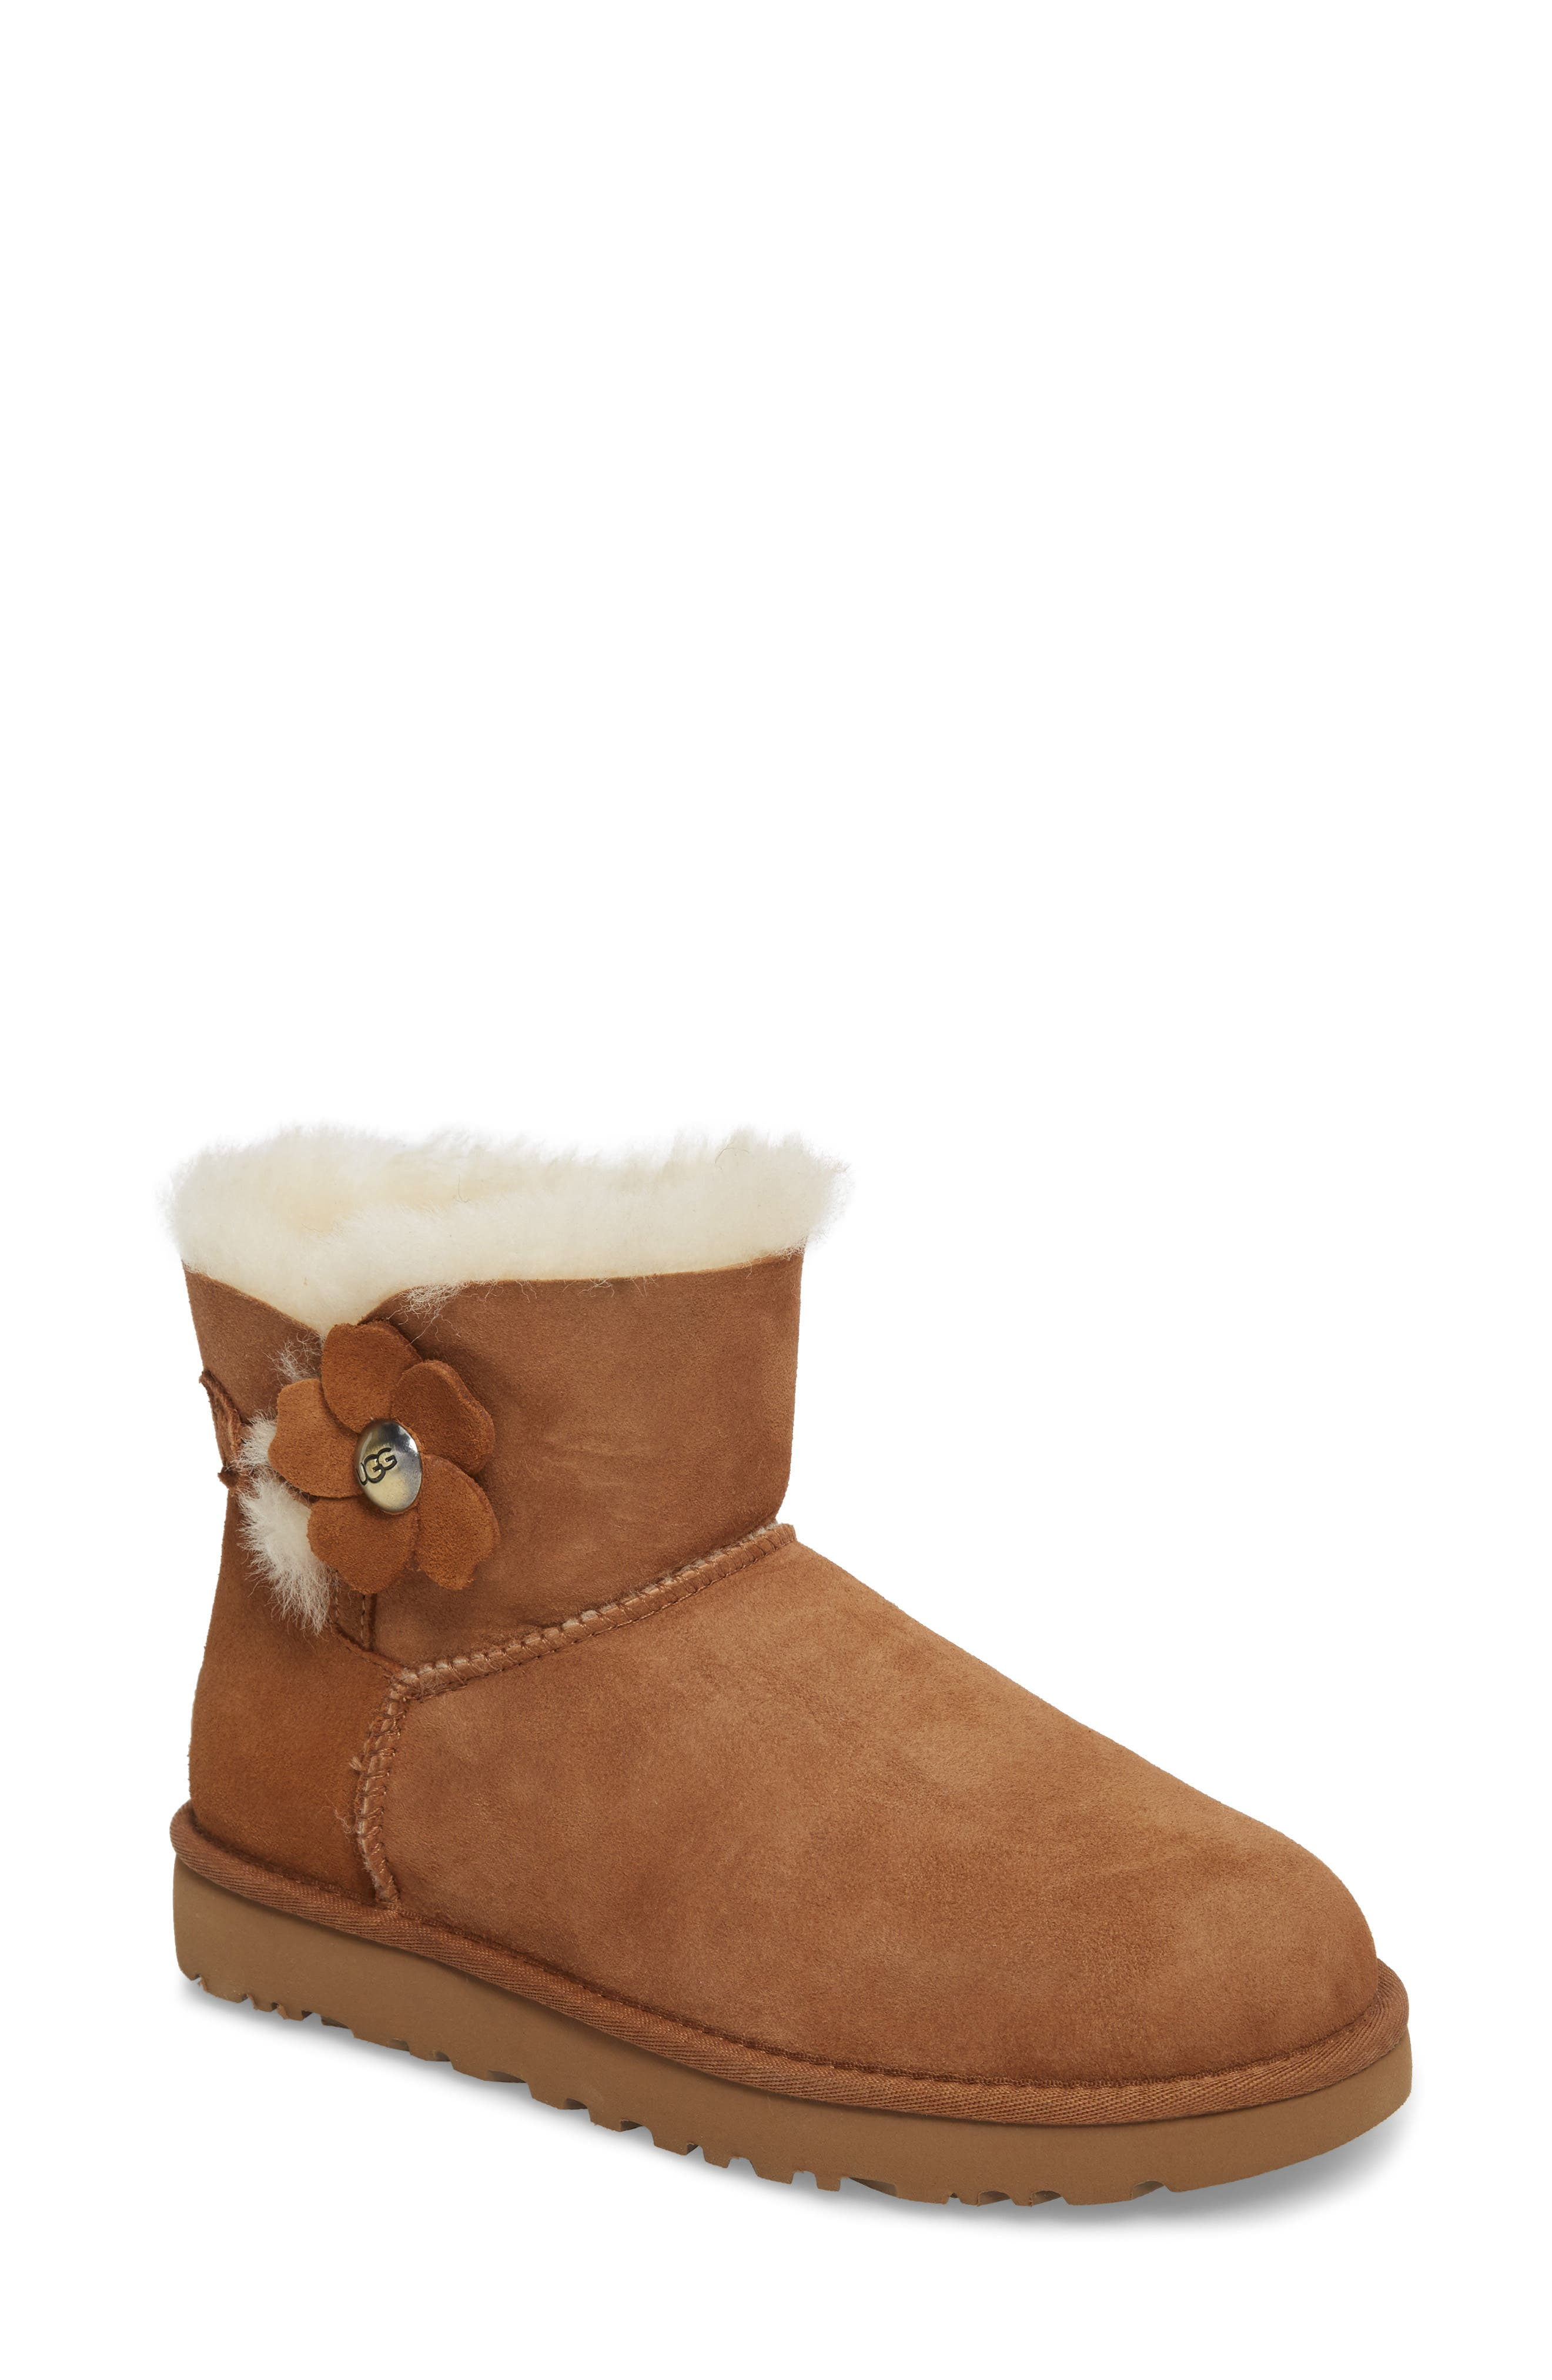 Main Image - UGG® Mini Bailey Button Poppy Genuine Shearling Lined Boot (Women)